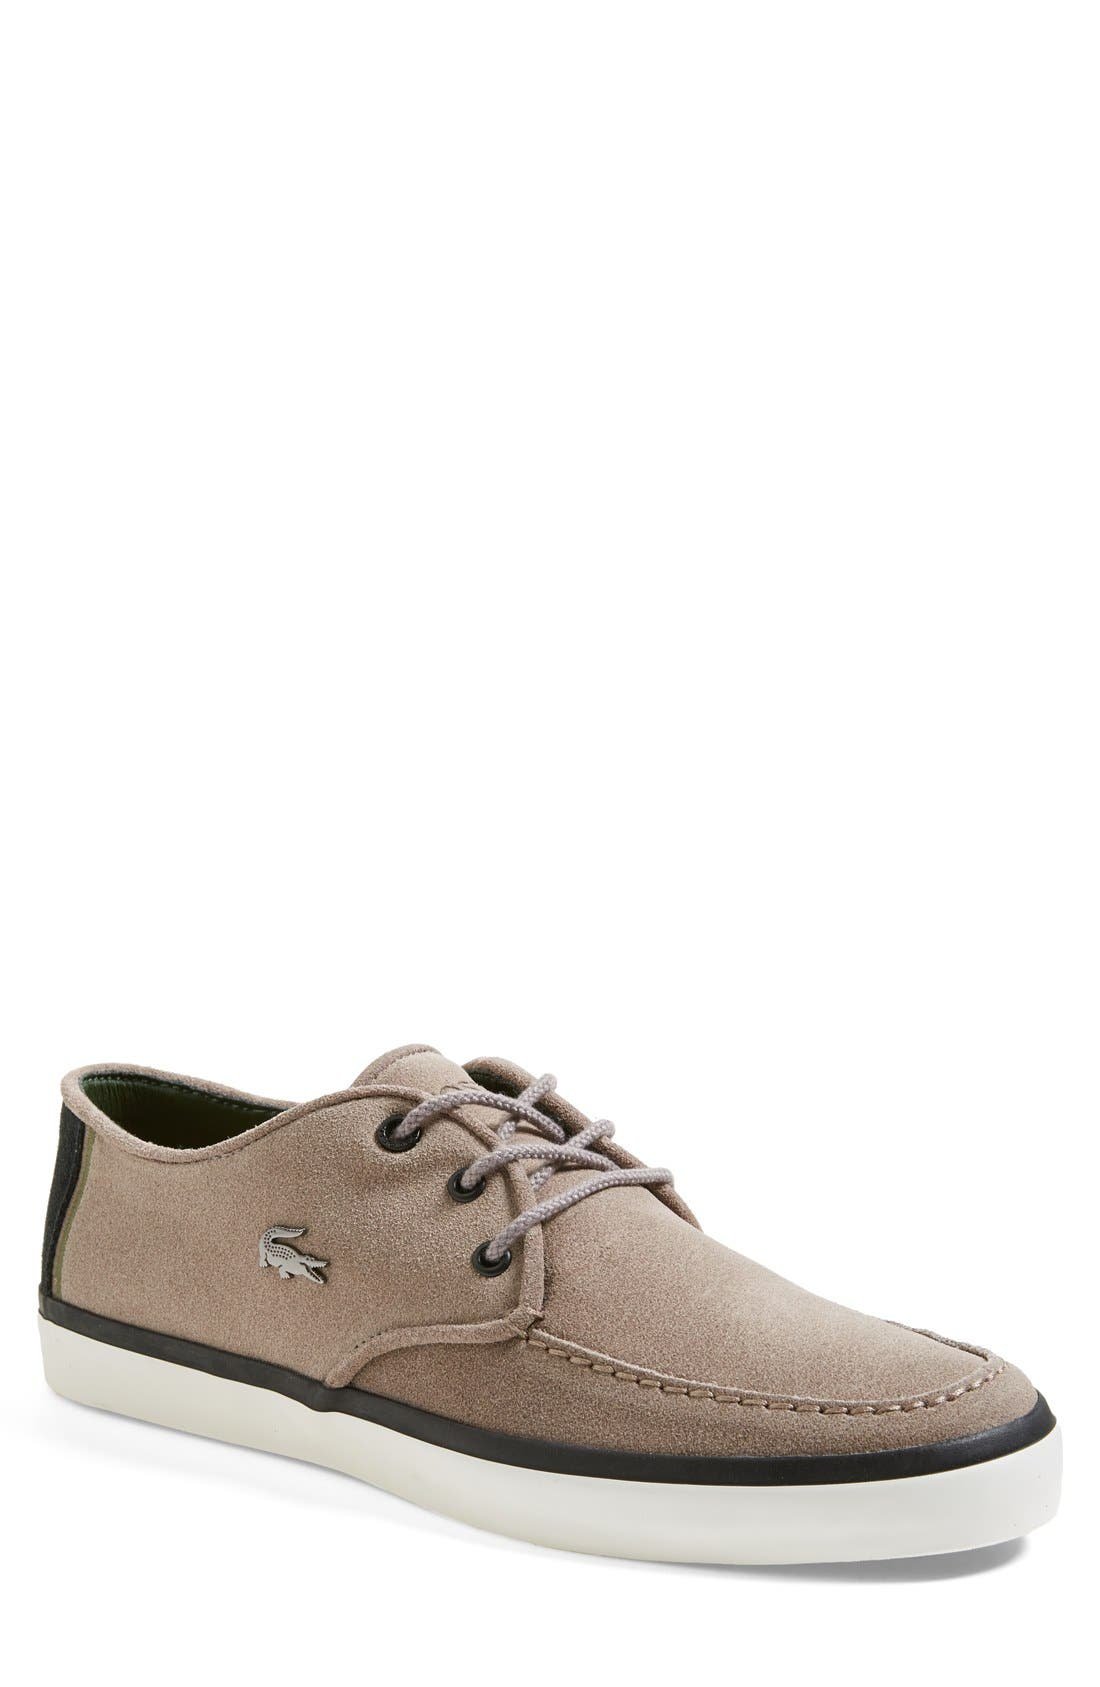 Main Image - Lacoste 'Sevrin 4' Sneaker (Men) (Online Only)